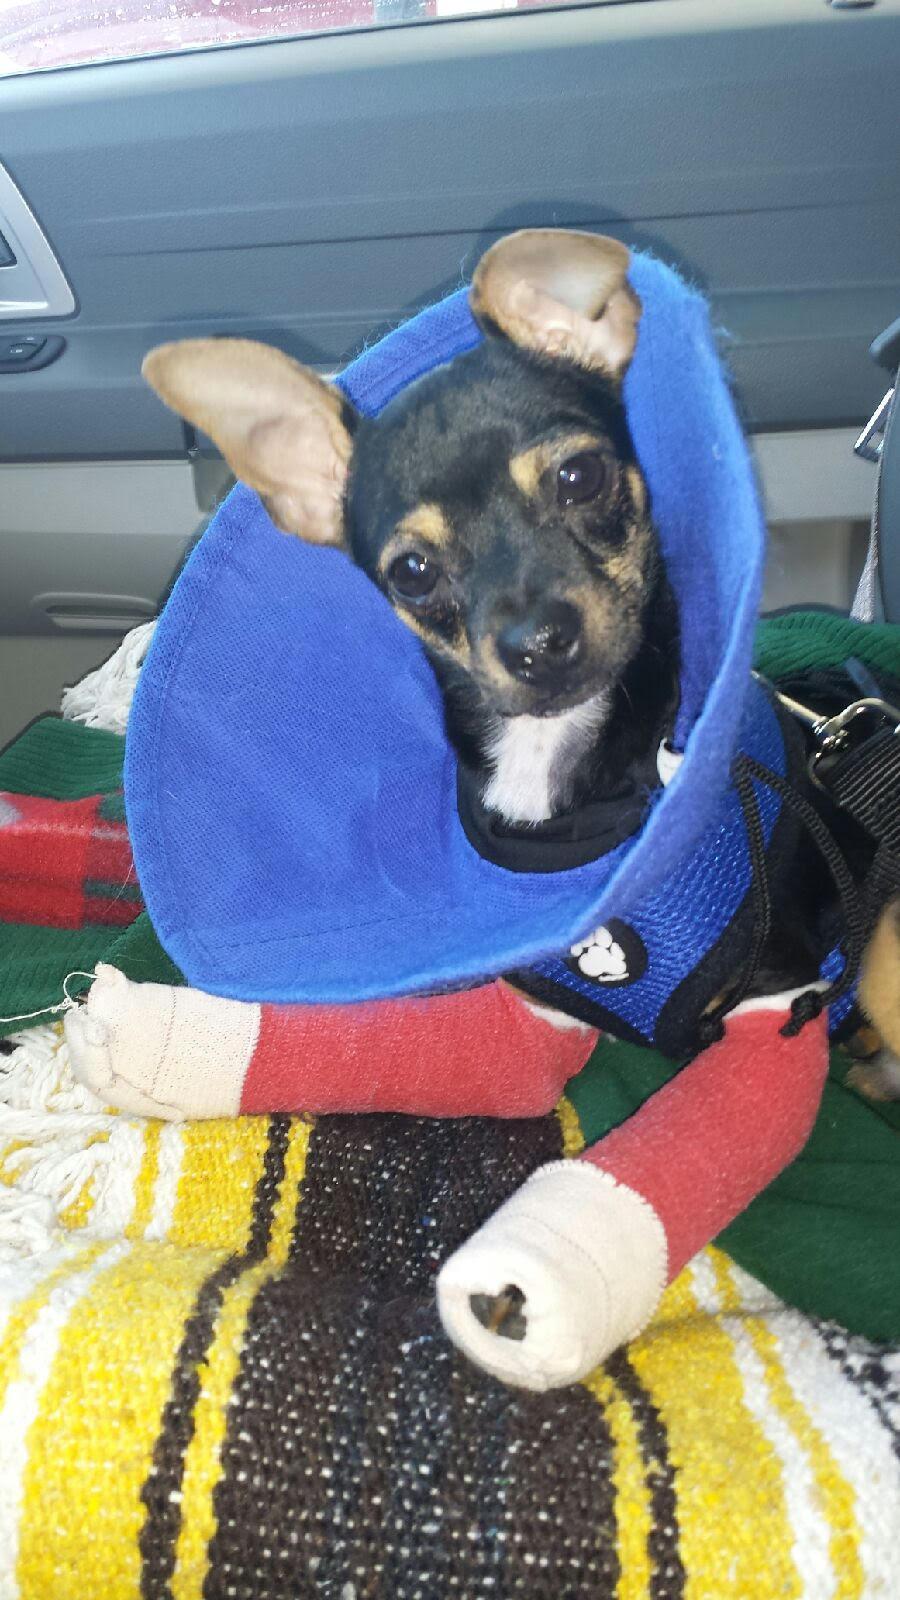 Fourth splint change. The cutest patient ever.